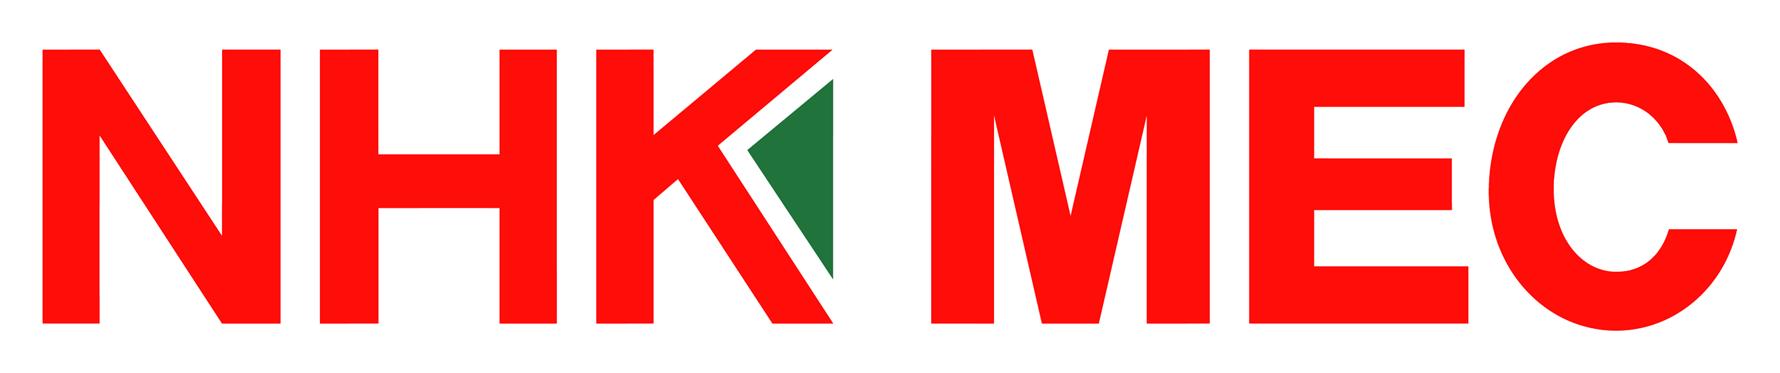 nhkmex-logo.png